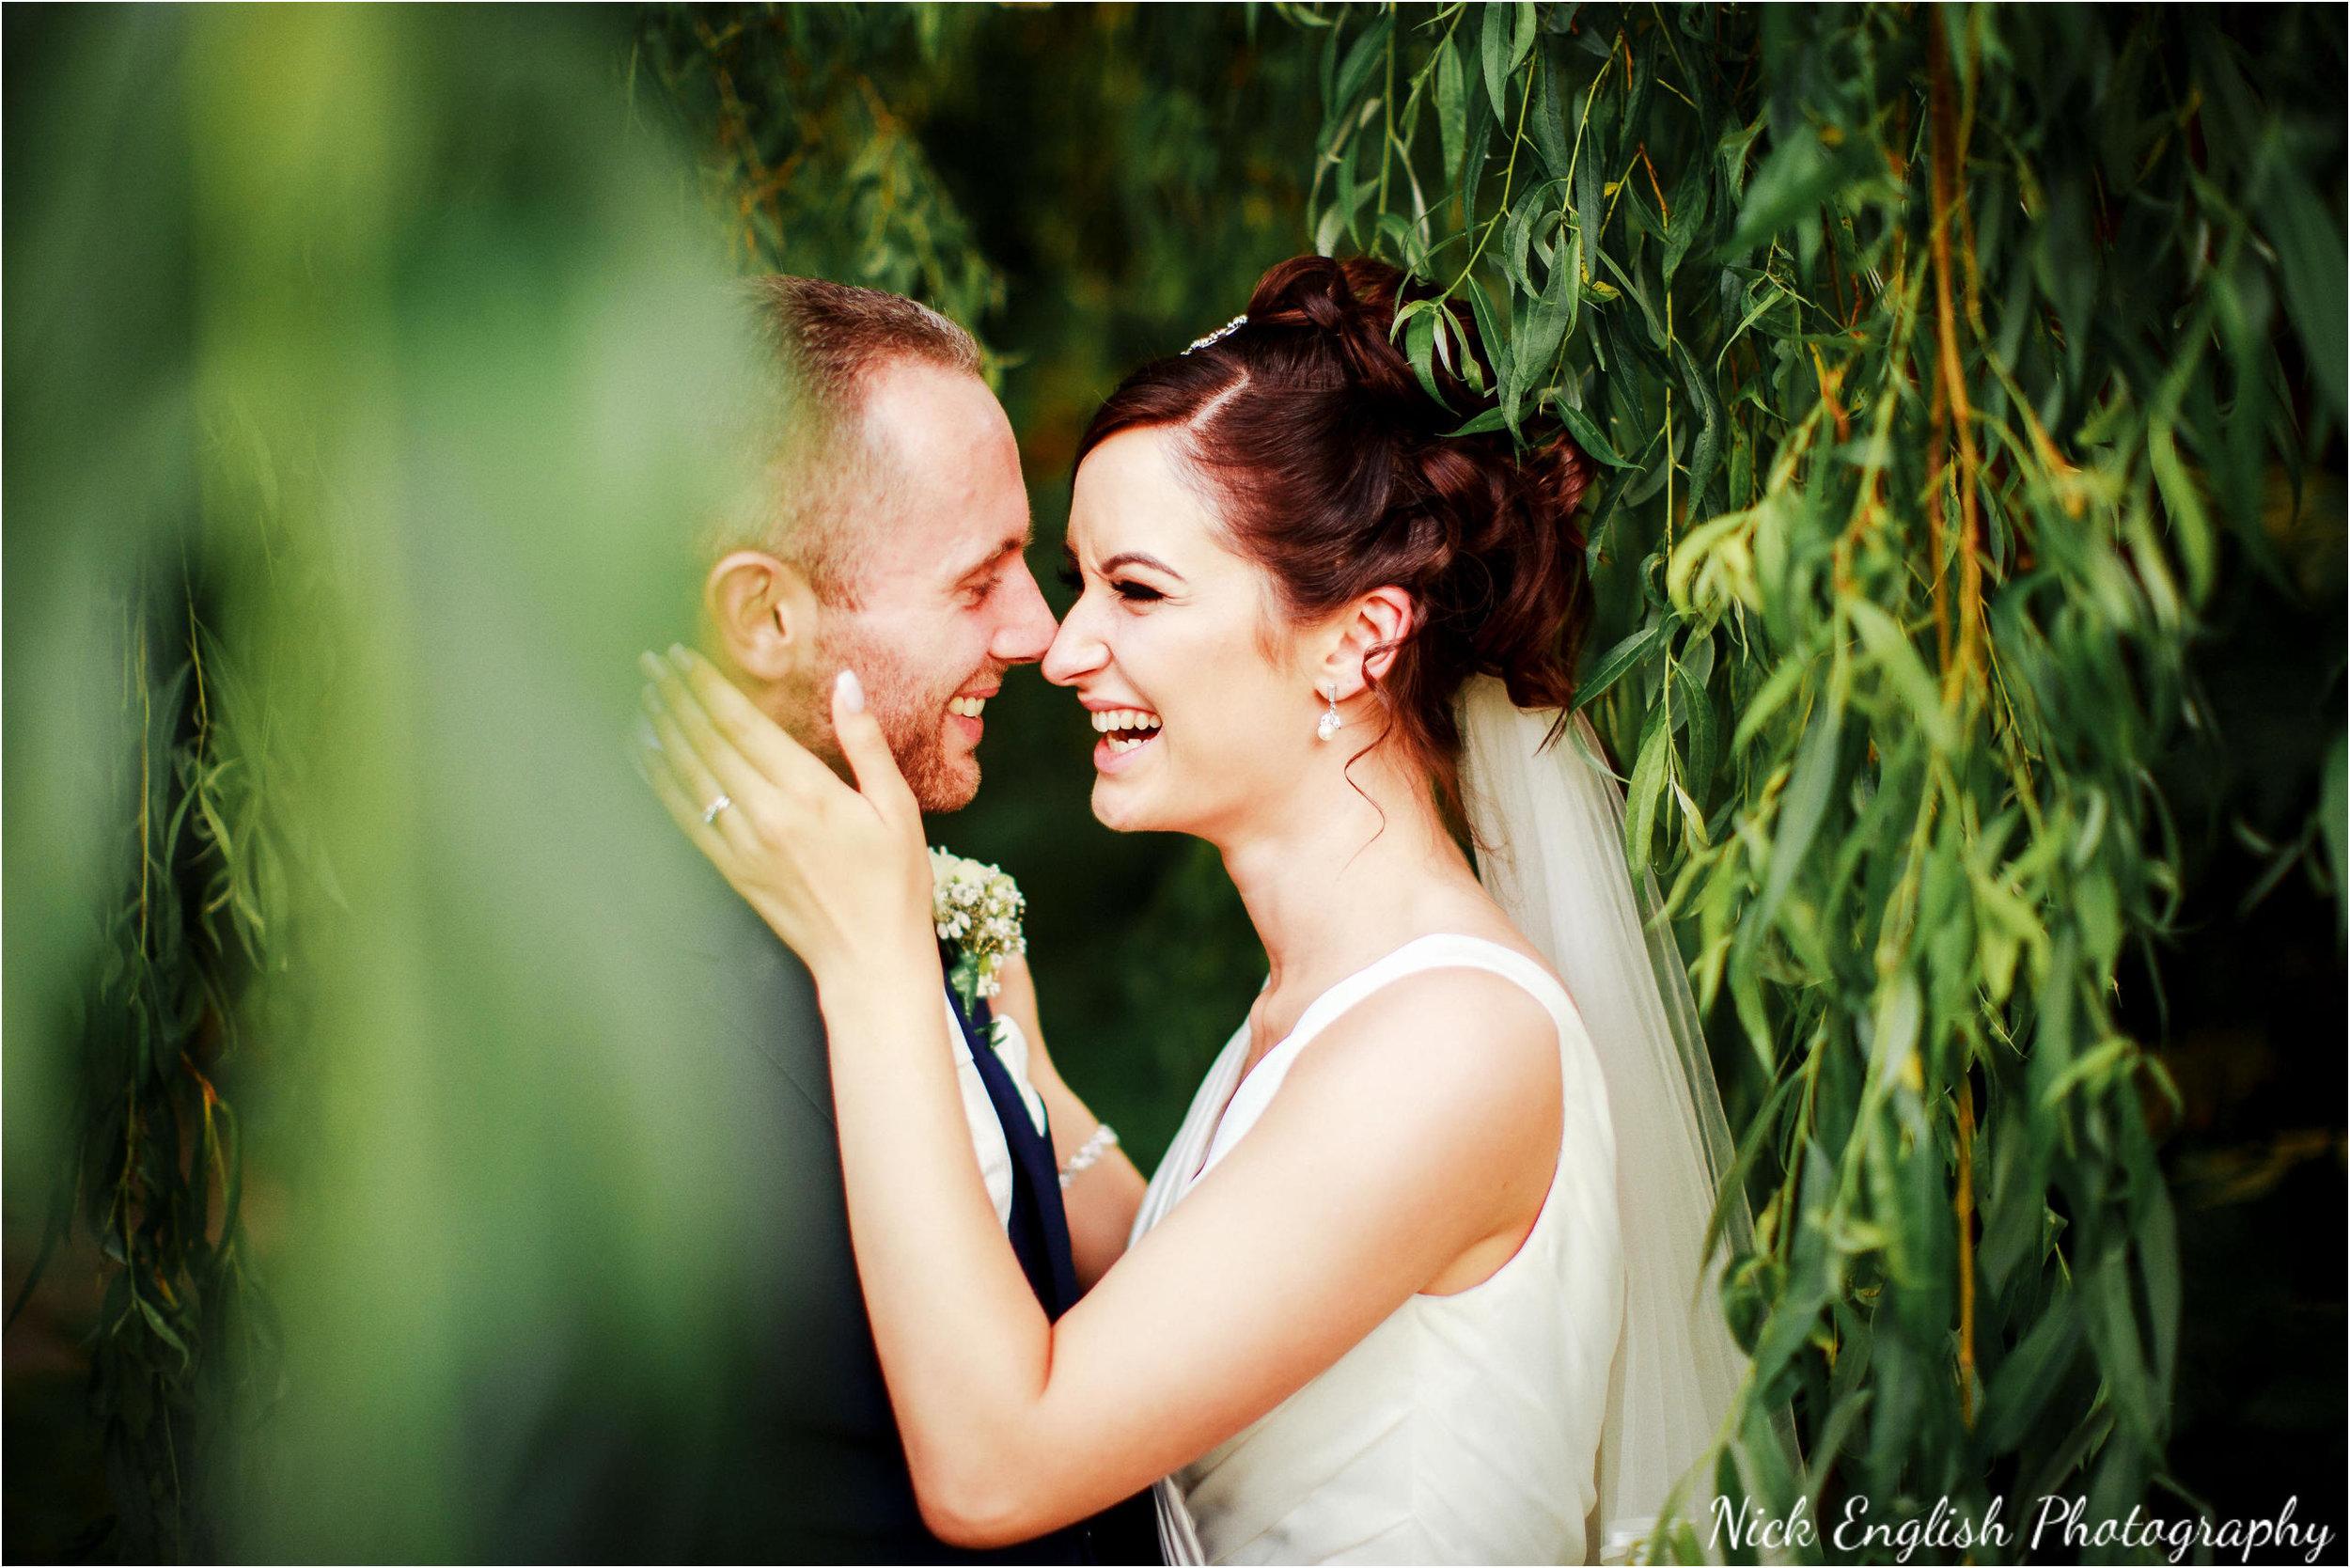 Emily David Wedding Photographs at Barton Grange Preston by Nick English Photography 201jpg.jpeg